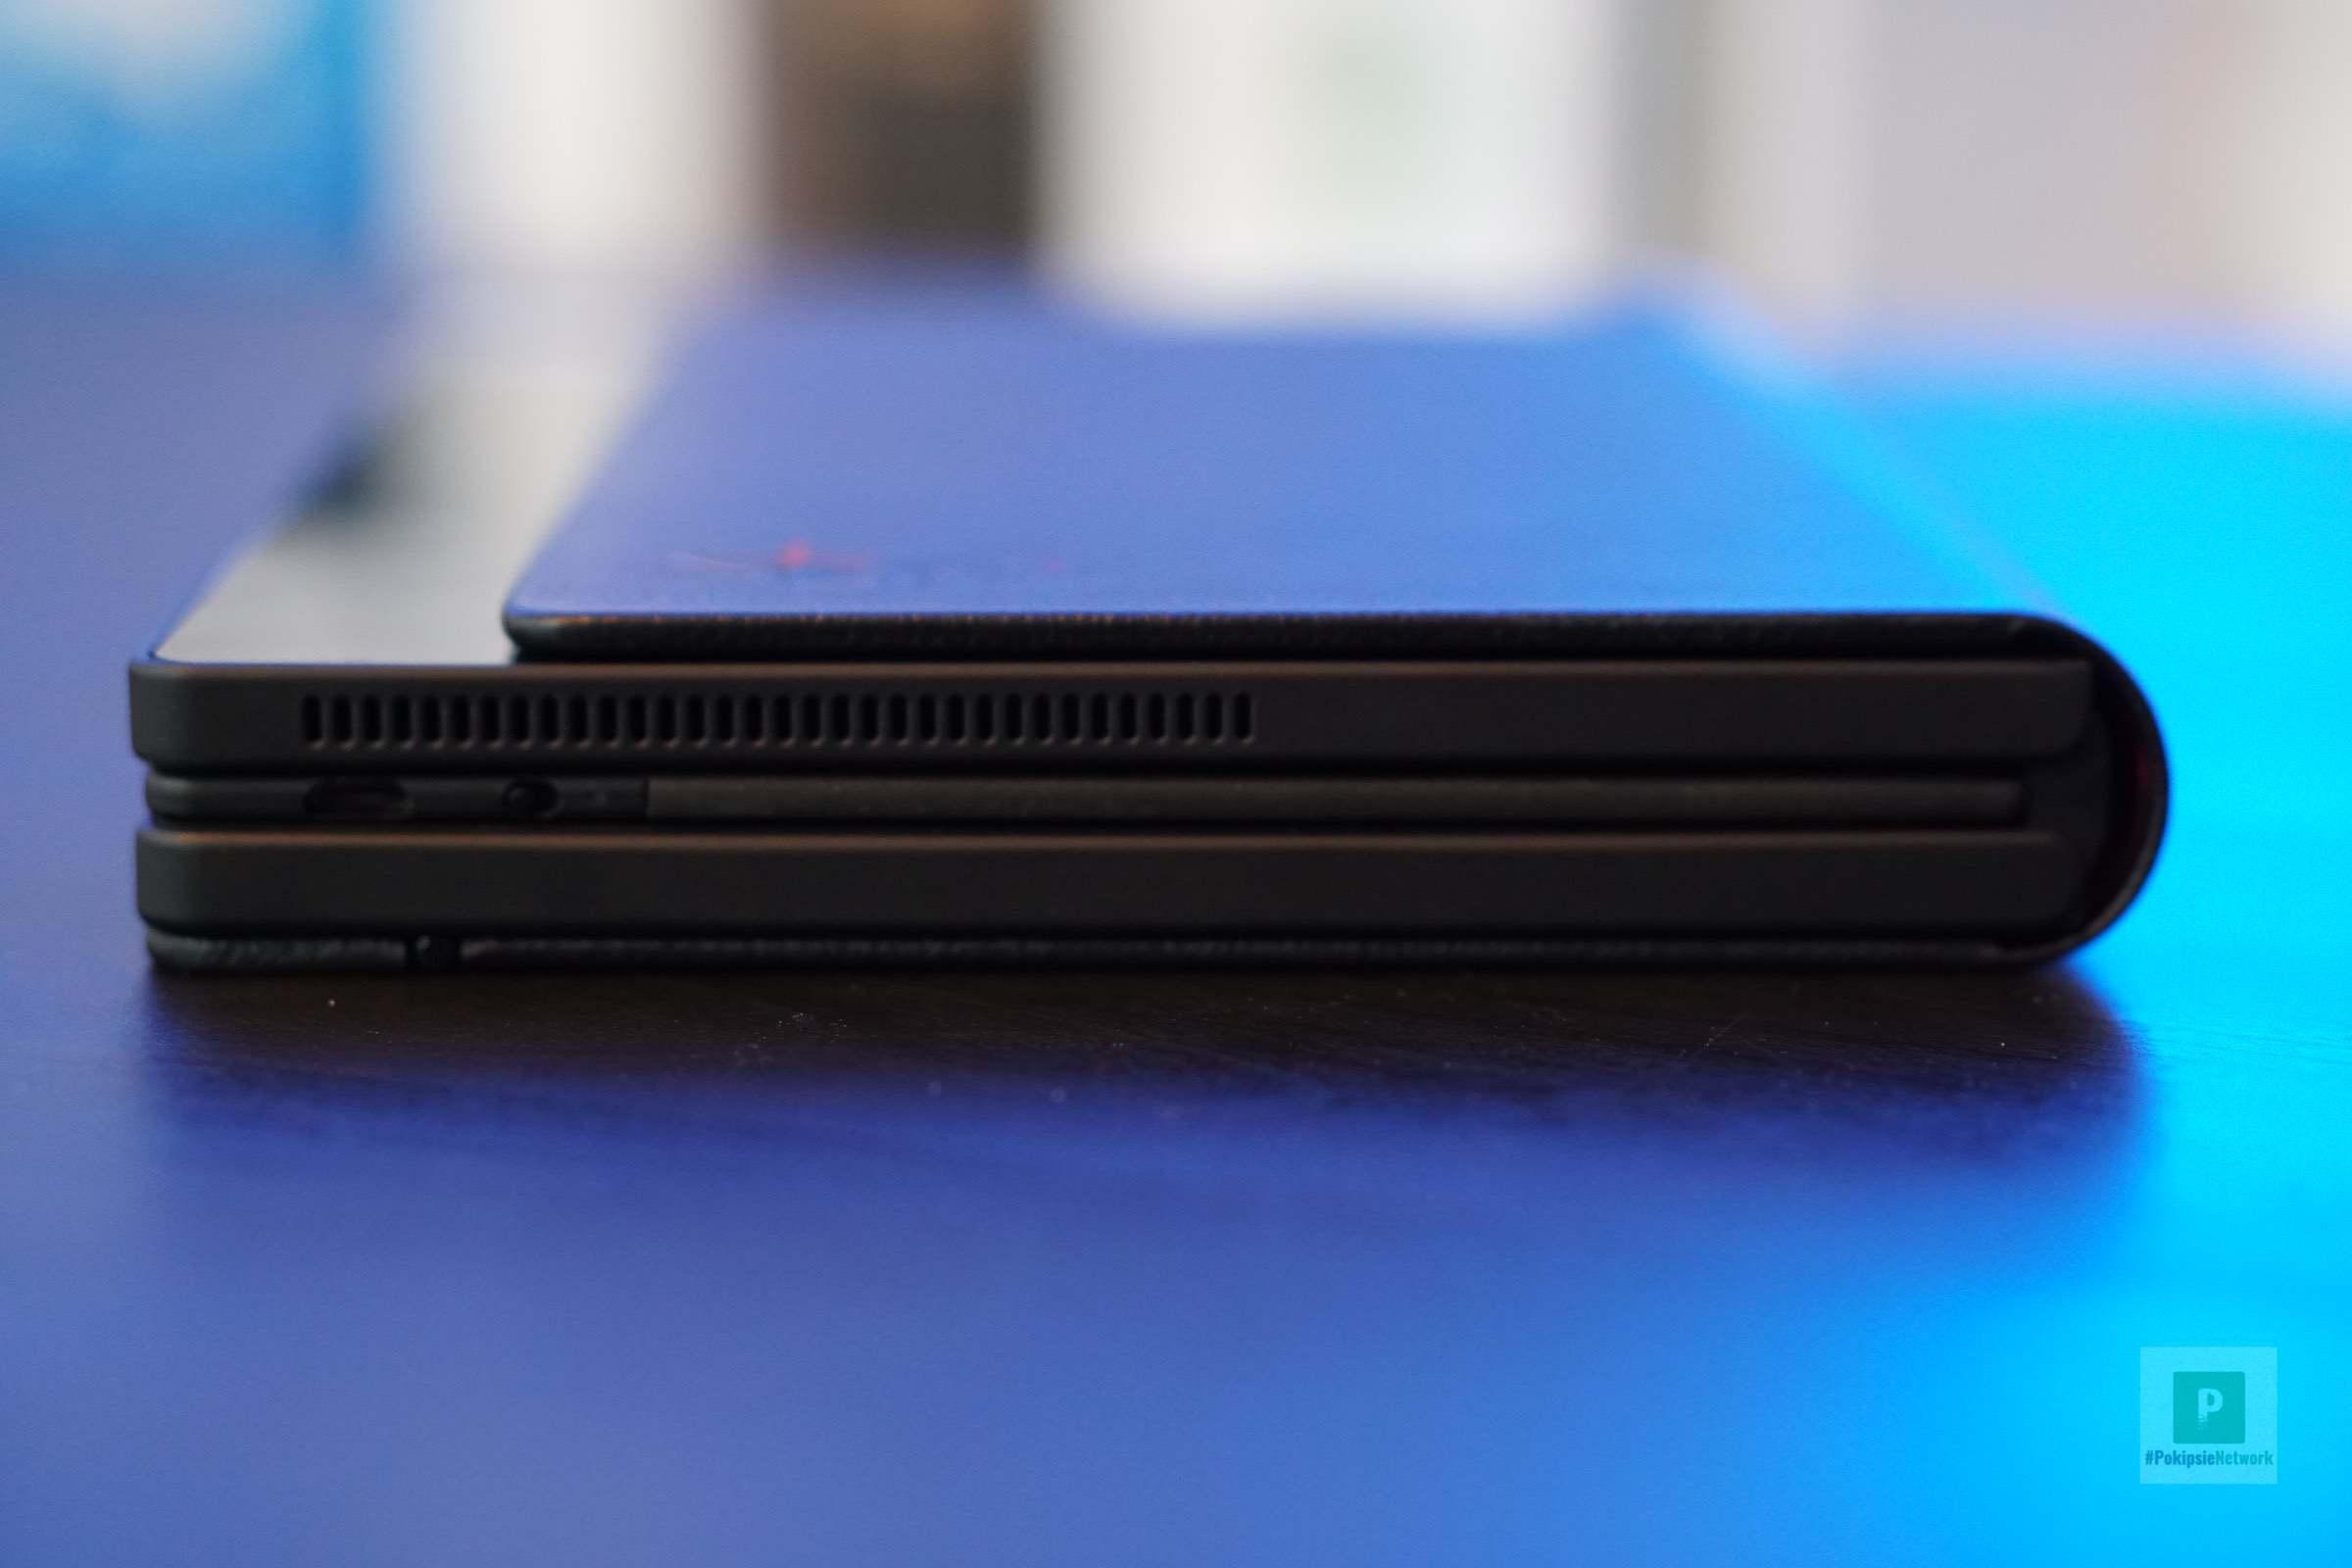 Tastatur im Tablet eingelegt